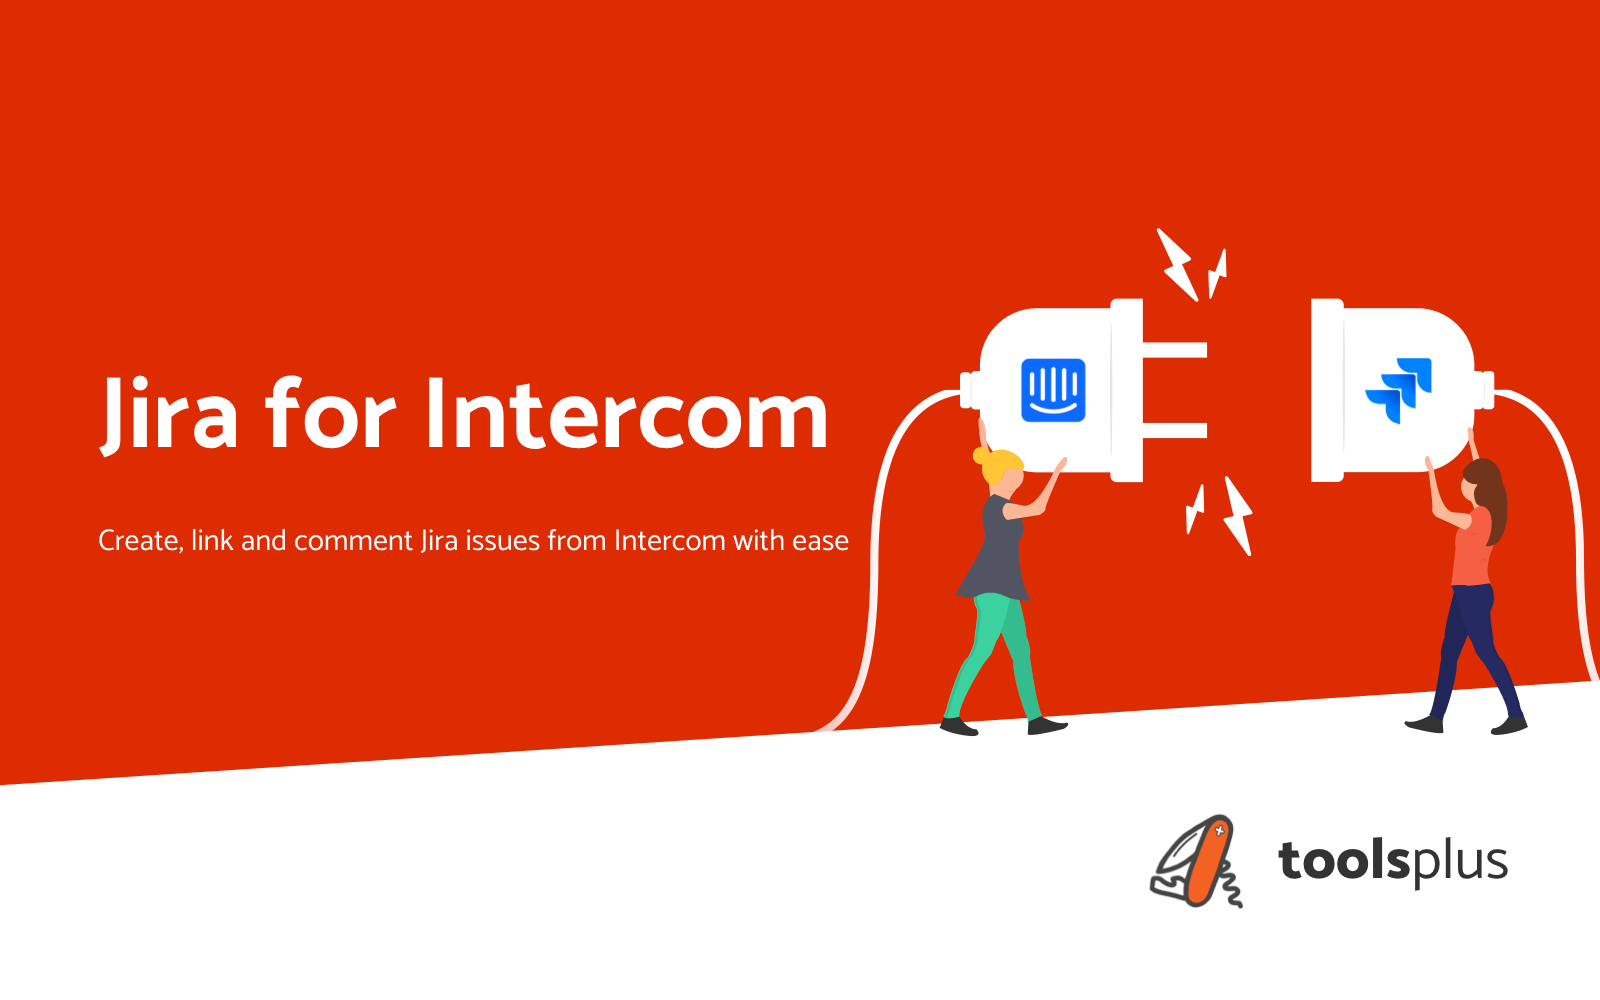 Jira app for Inetrcom